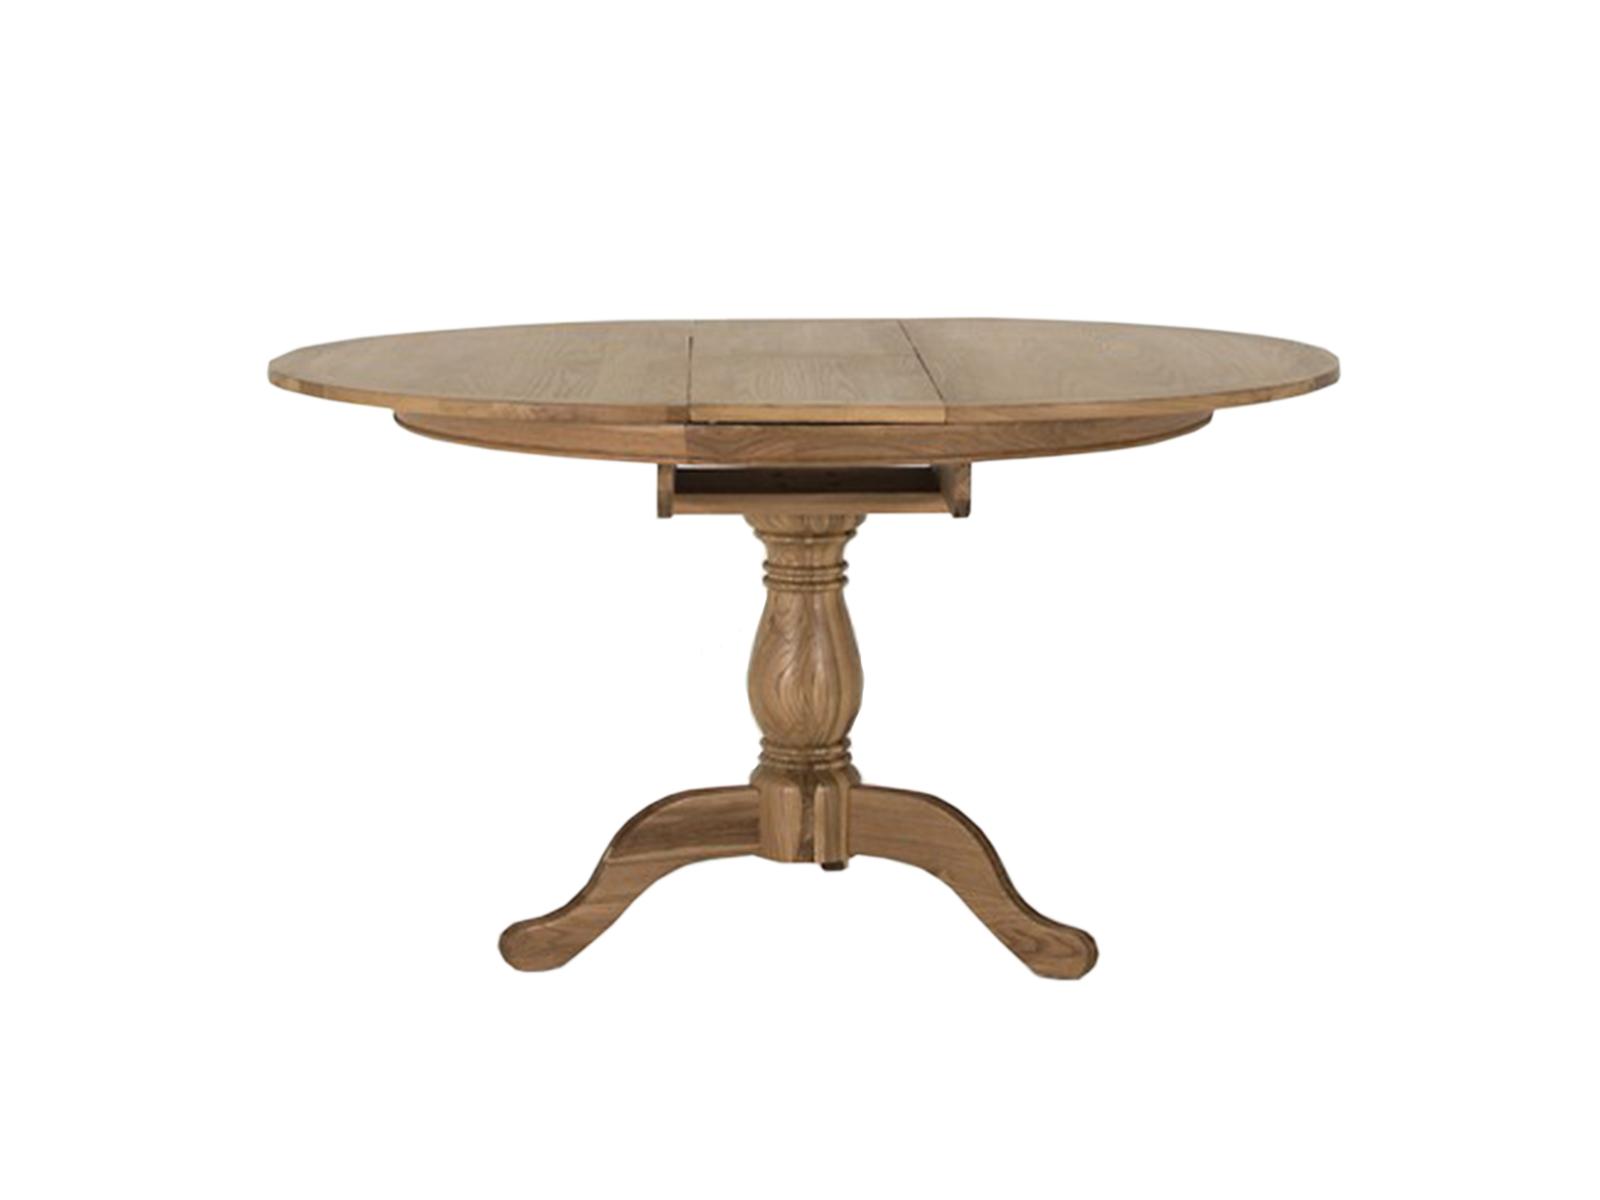 Masa extensibila din lemn de stejar Carmen Round, L112-142xl112 x h77 cm